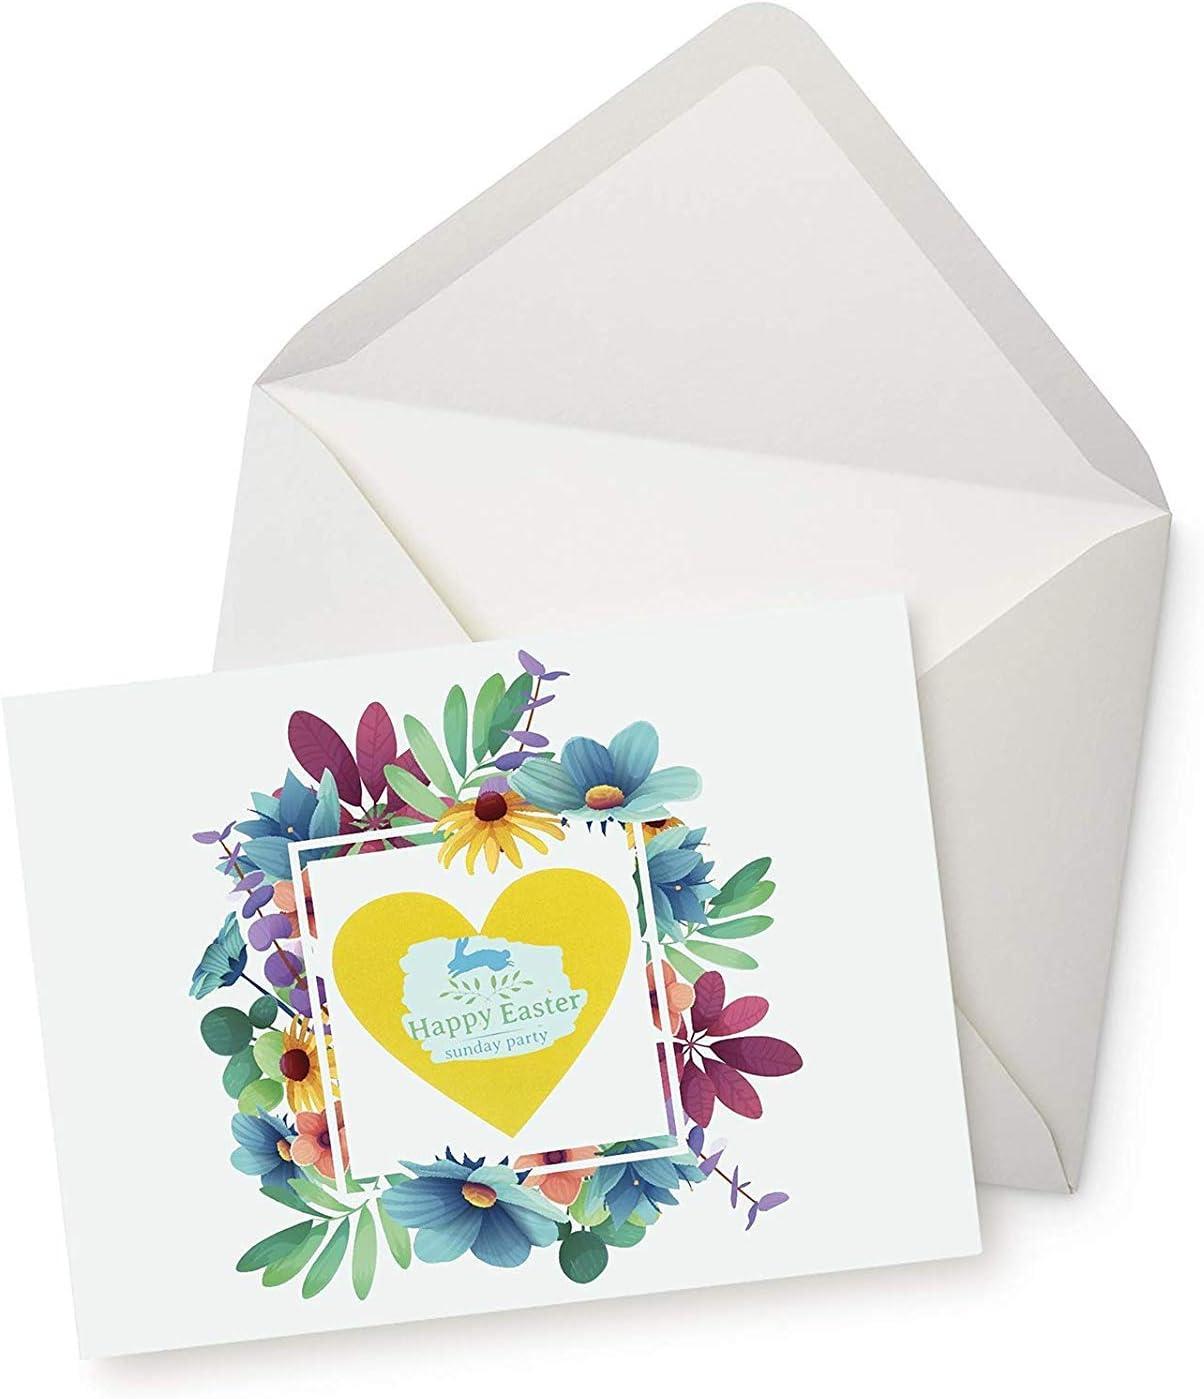 ANKKY Etichette Rubbel Rubbellose 50pcs Rubbelsticker per Schwanger Rubbelkarten /Überraschung Rubbelettiketten und DIY Rubbelkarten Geburtstag Taufe Hochzeit